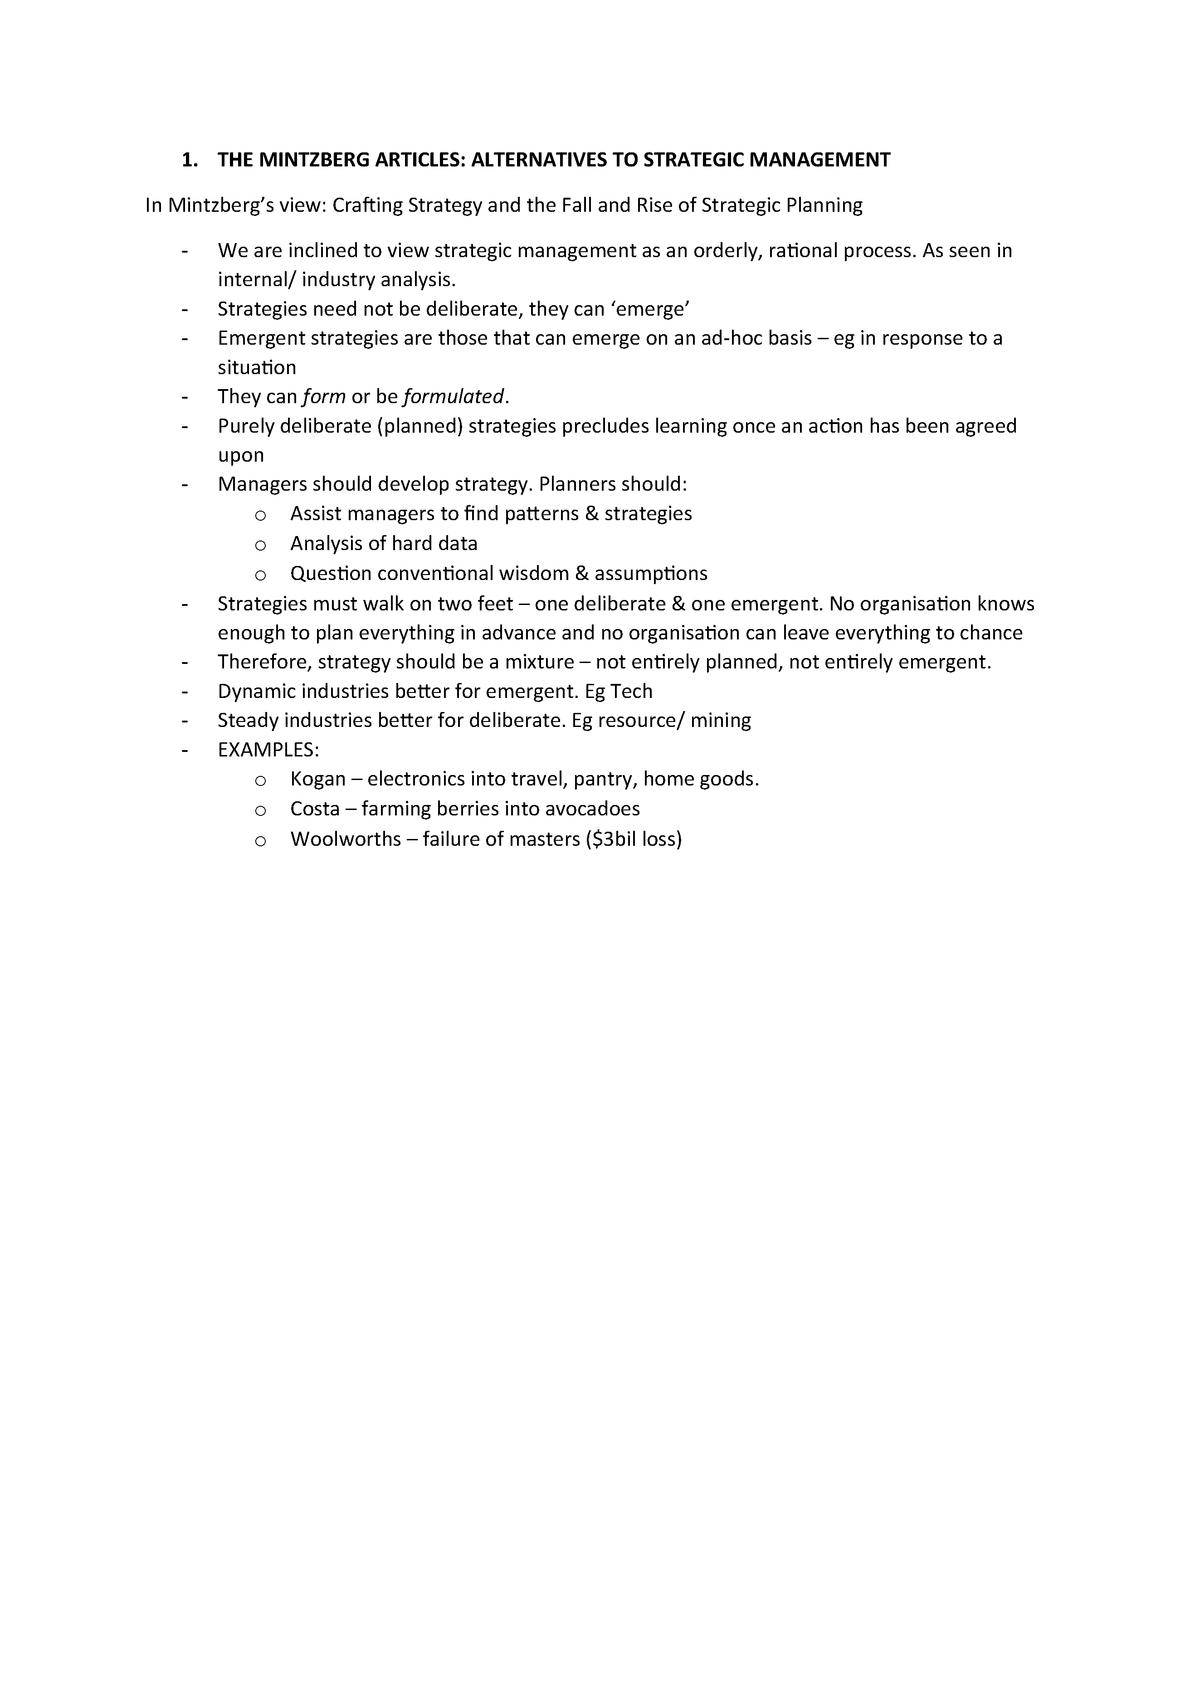 Exam 2016 - MM403: Strategic Planning and Management - StuDocu